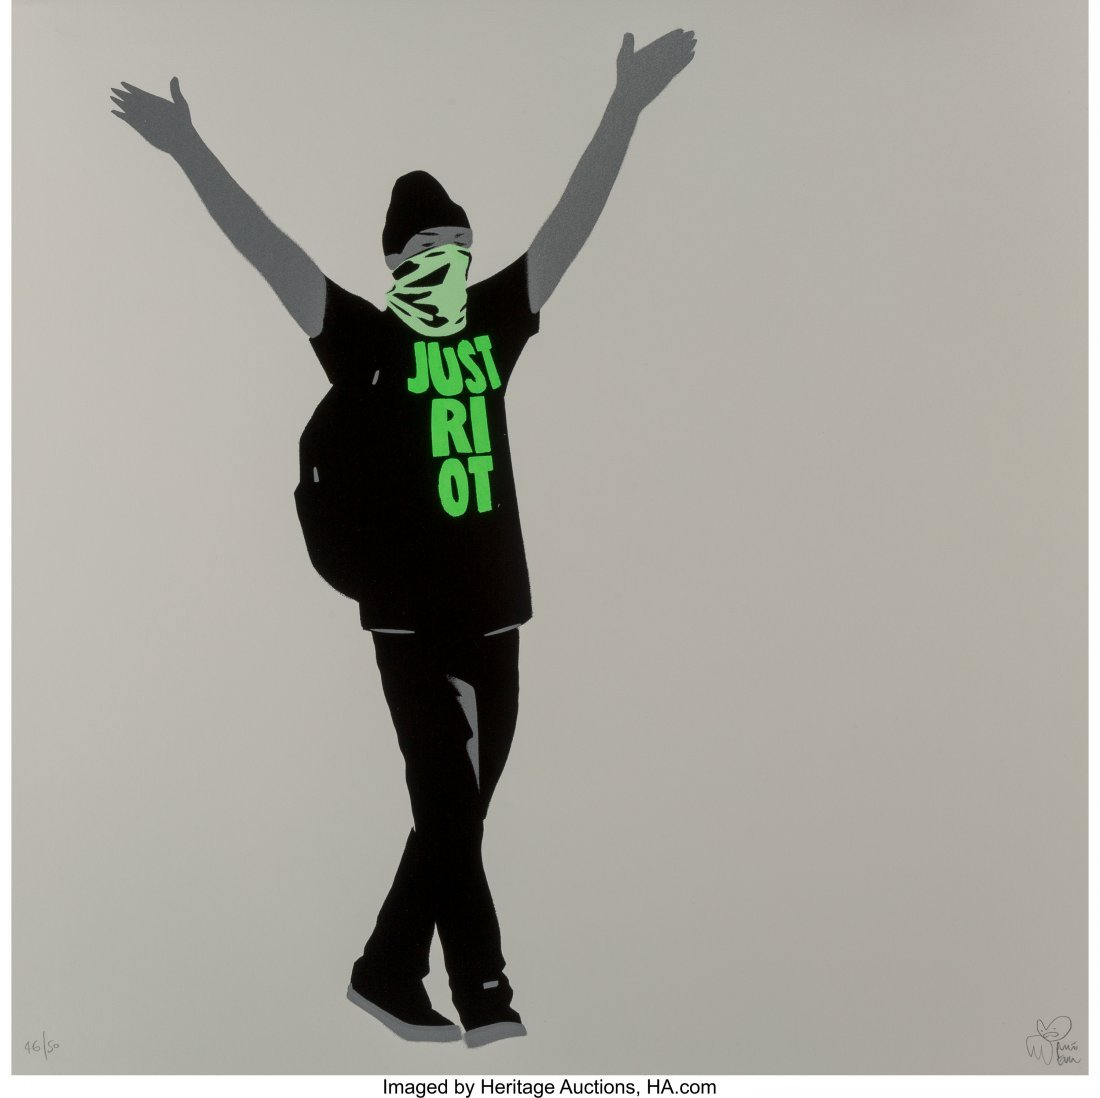 60166: Pure Evil (b. 1968) Just Riot (Fleuro Green), 20